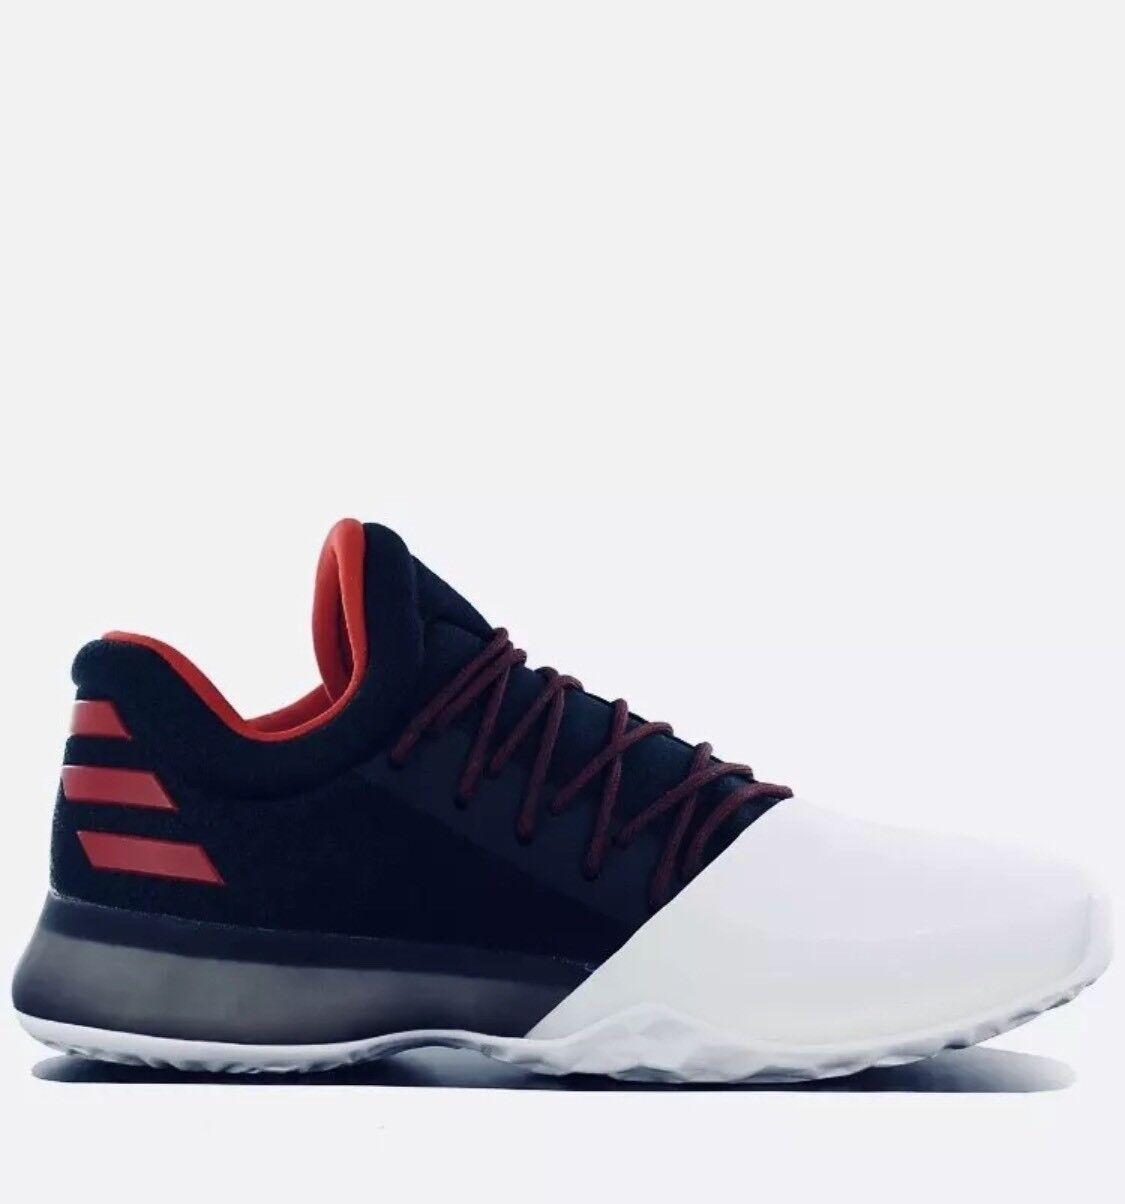 fe49e950a116 New Adidas James Harden Vol. 1 Pioneer Mens Basketball Shoe Shoe Shoe Boost  BW0546 Sz